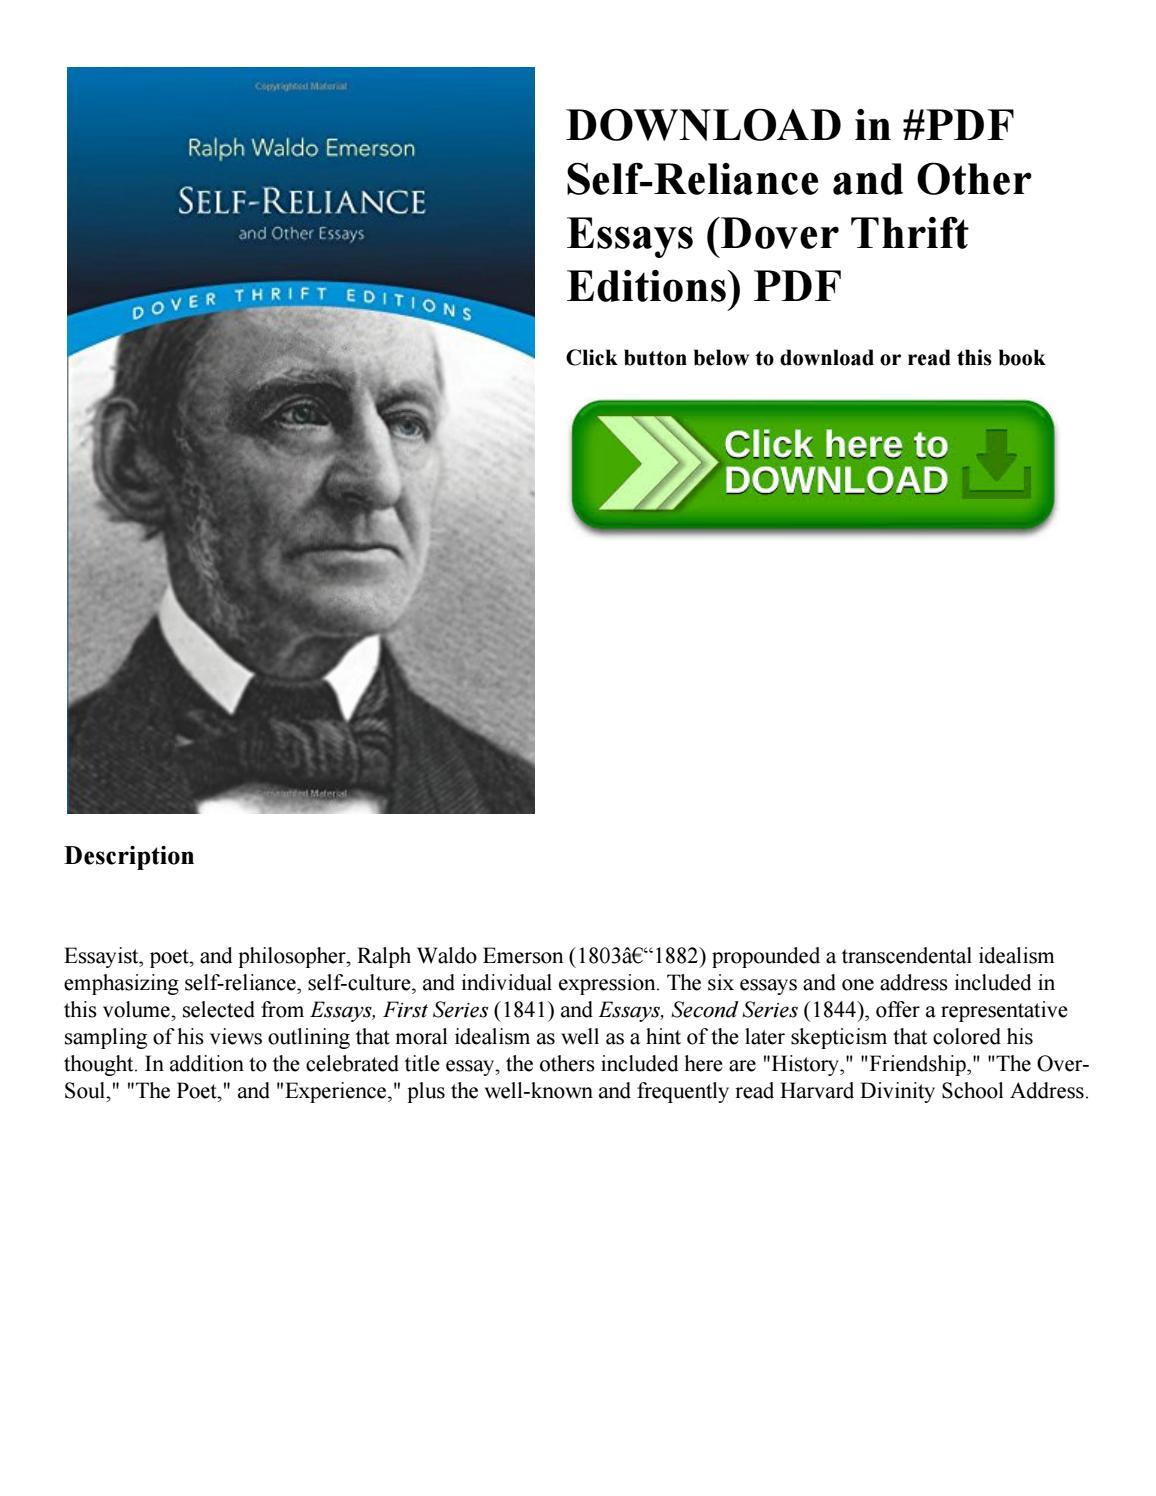 007 Page 1 Self Reliance And Other Essays Essay Formidable Ralph Waldo Emerson Pdf Ekşi Full